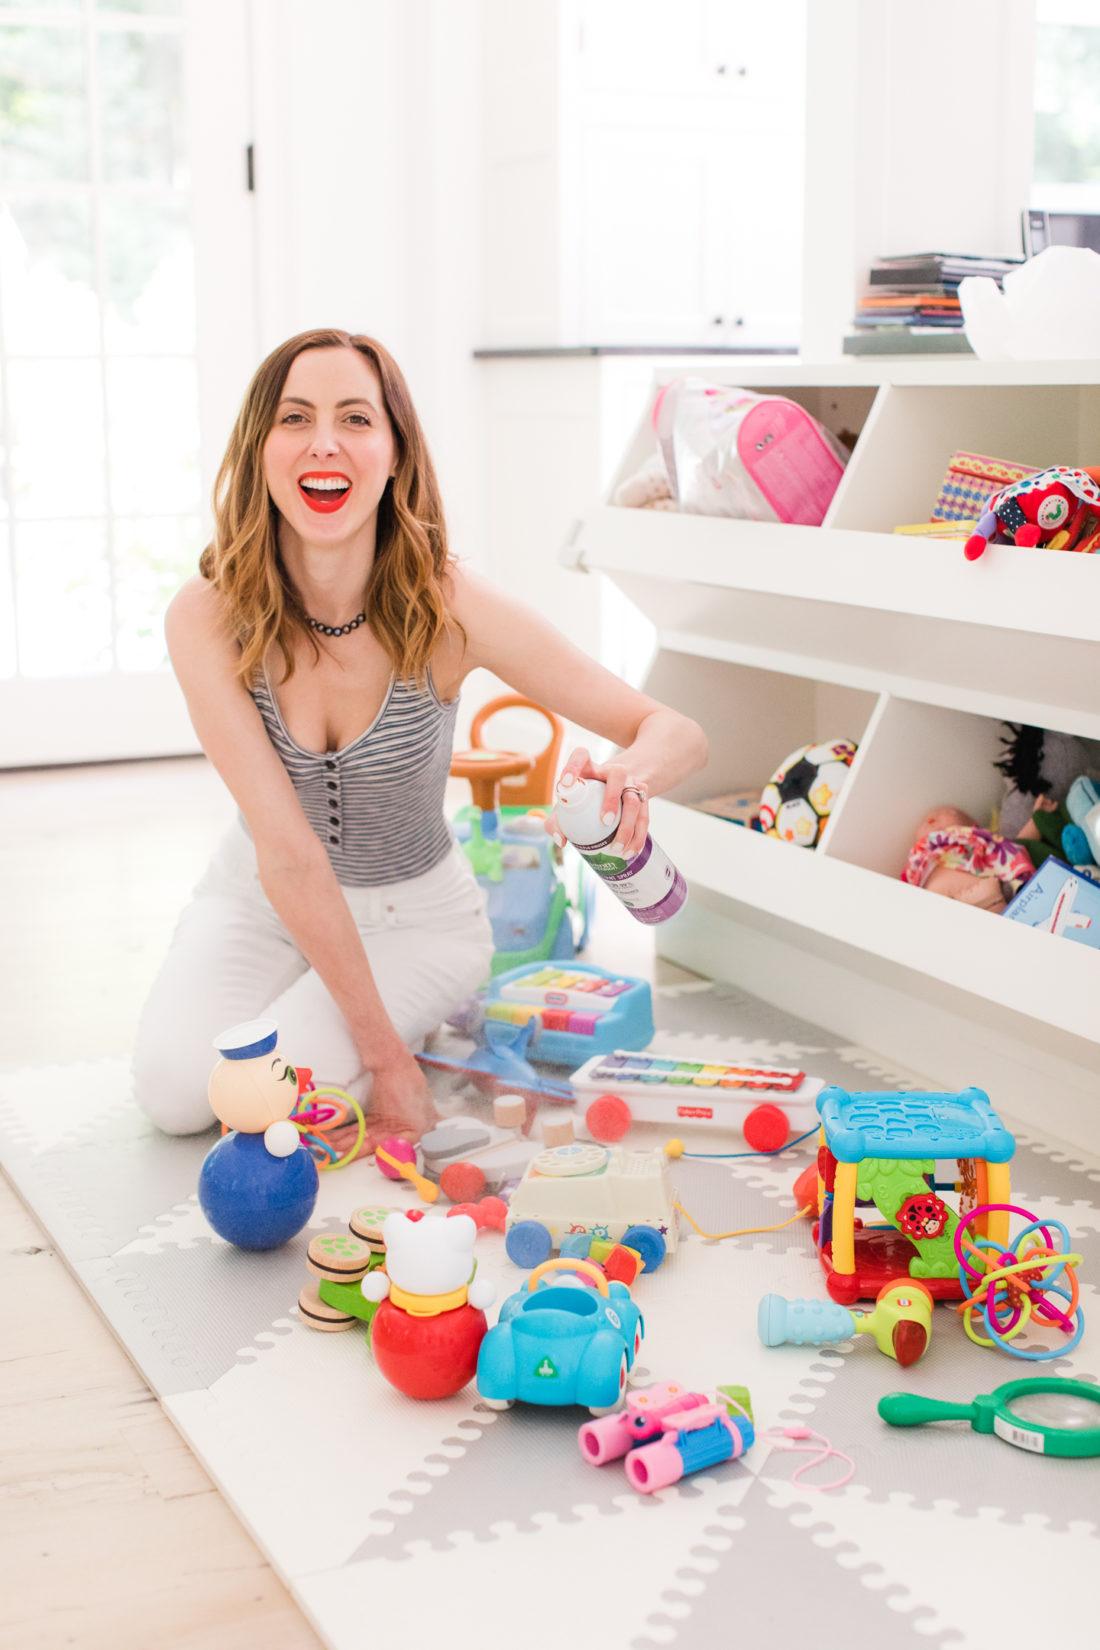 Eva Amurri Martino sprays her children's toys with Seventh Generation botanical disinfecting spray